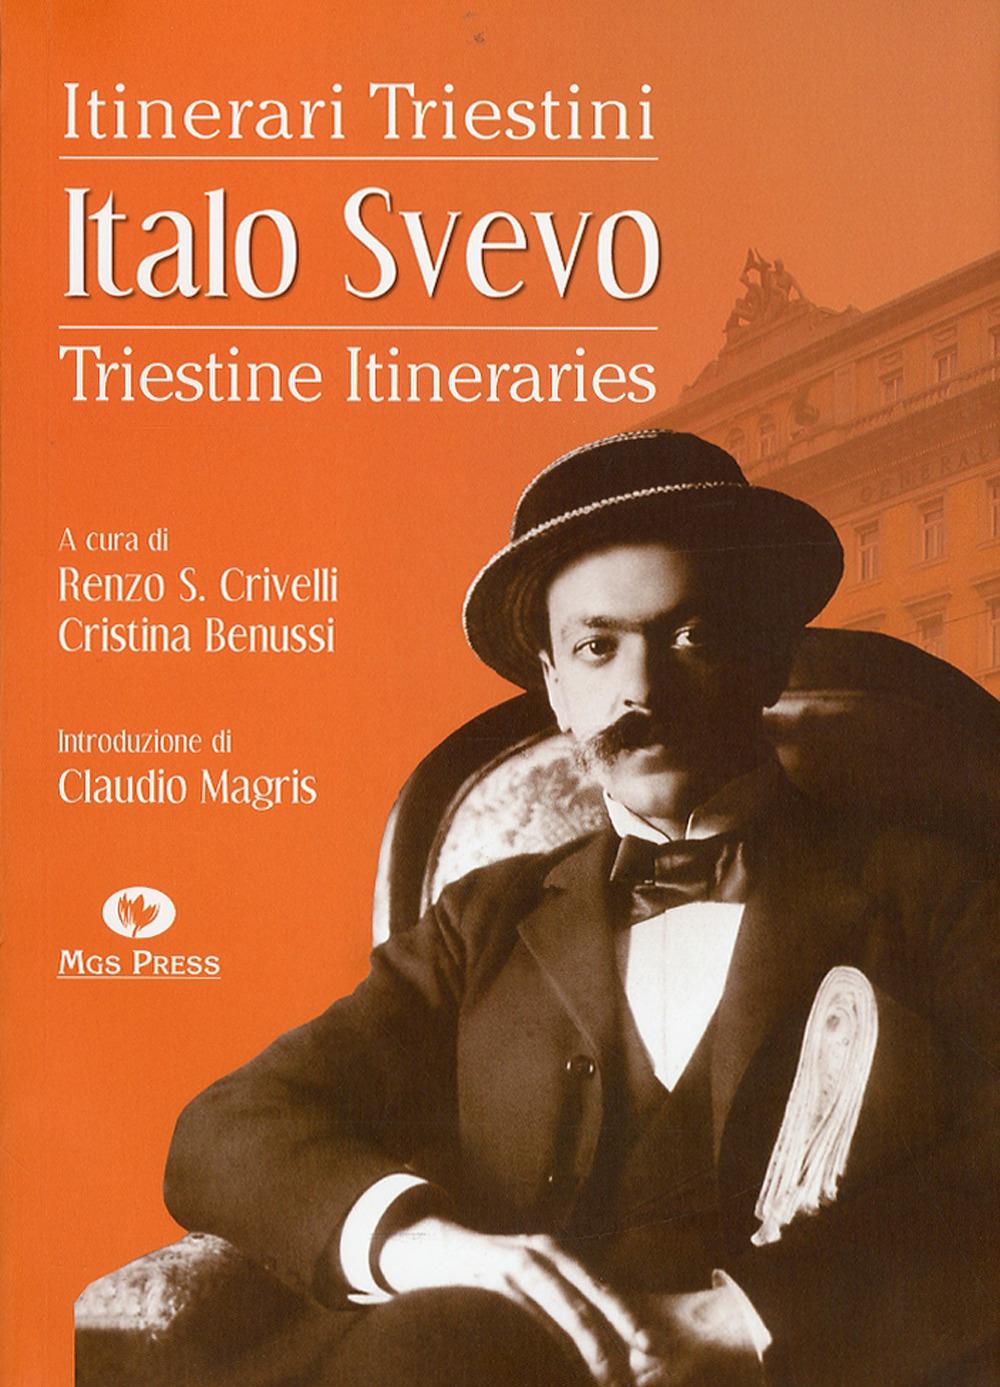 Italo Svevo. Itinerari triestini-Triestine Itineraries. Ediz. bilingue